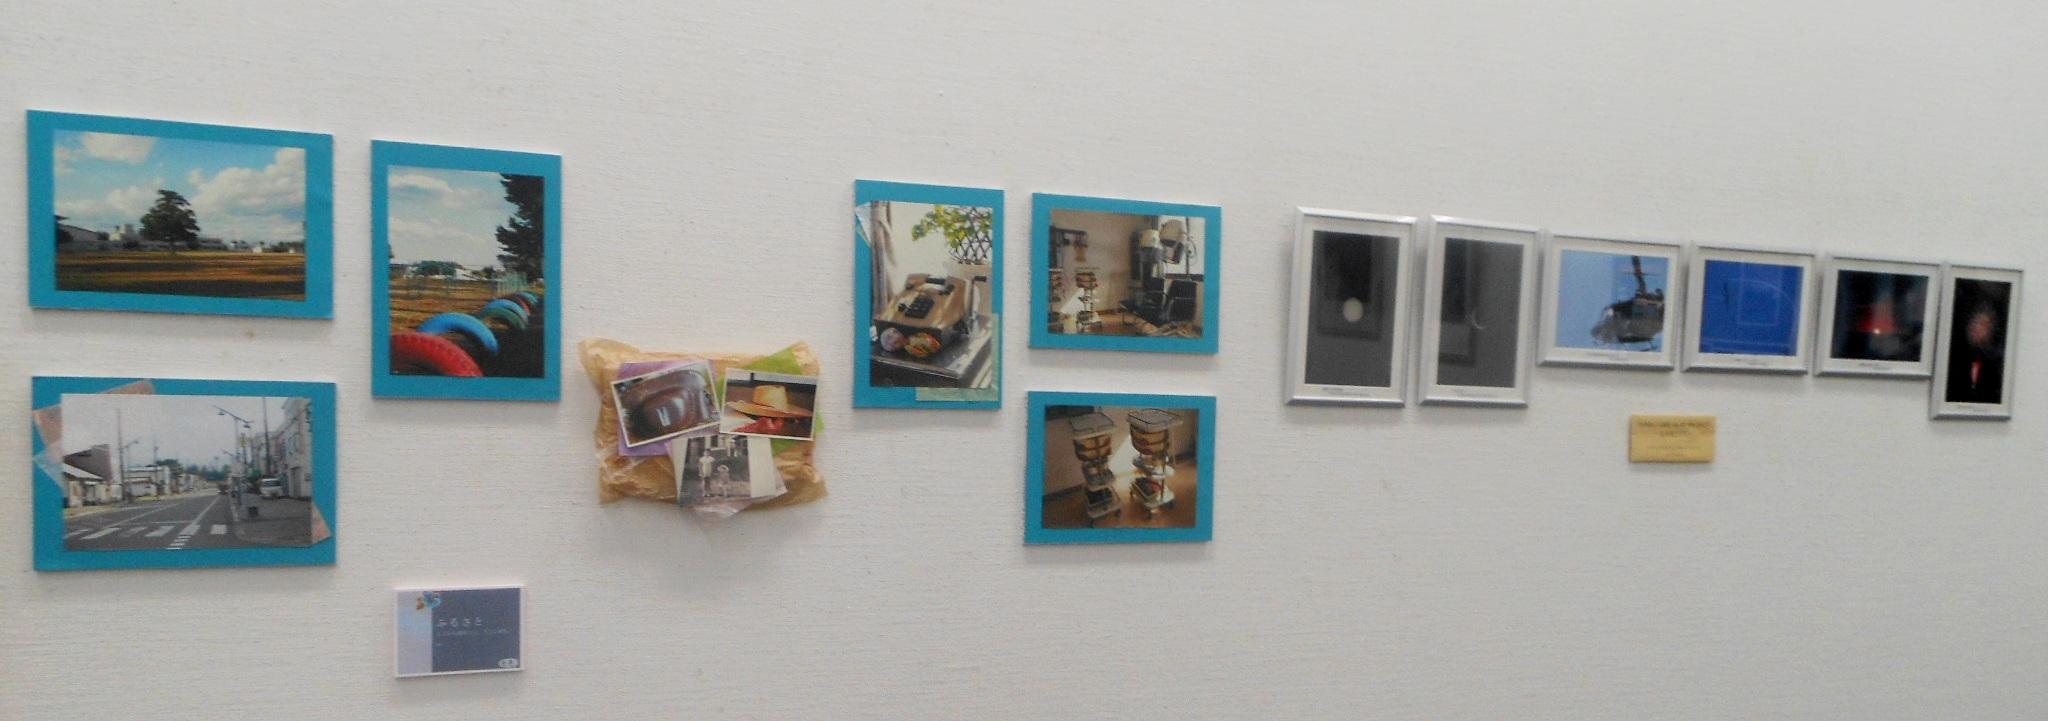 1888)③「写真クラブ「BePHaT!!」 第9回作品展 『夢 Photo 2012』」市民g. 終了11月21日(水)~11月25日(日)_f0126829_0131635.jpg